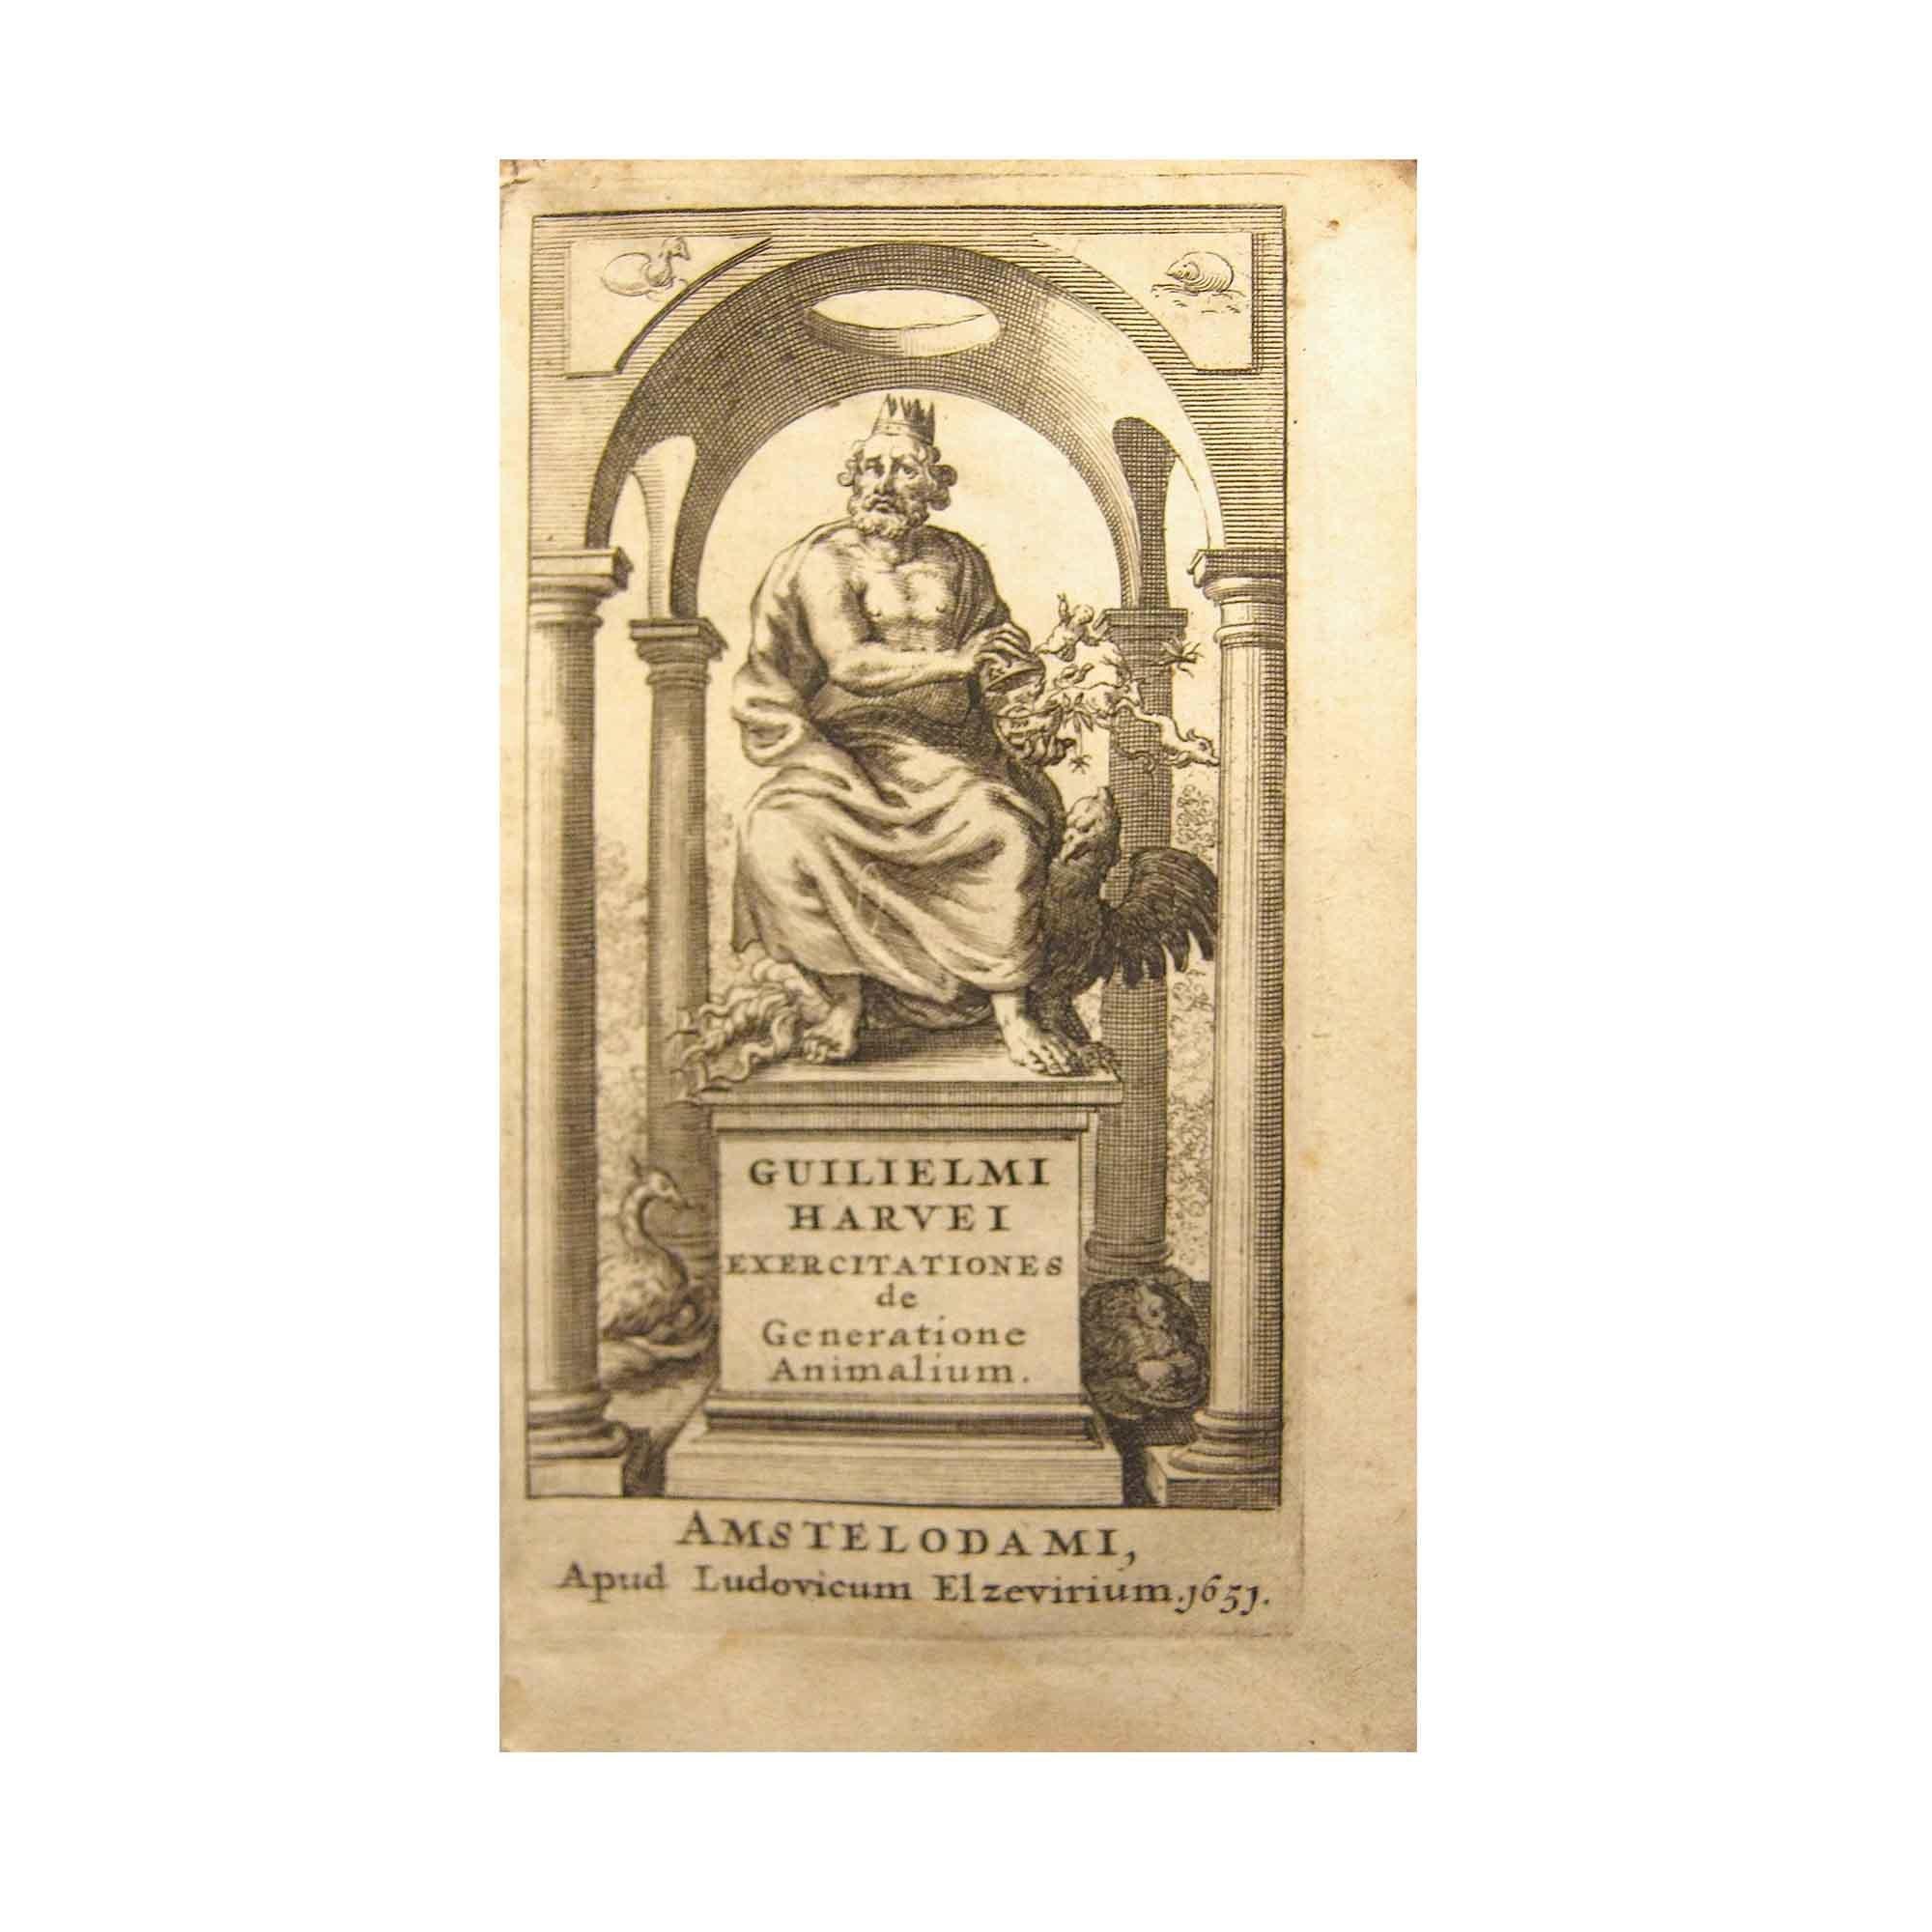 Harvey Generatione Animalium 1653 Titel N